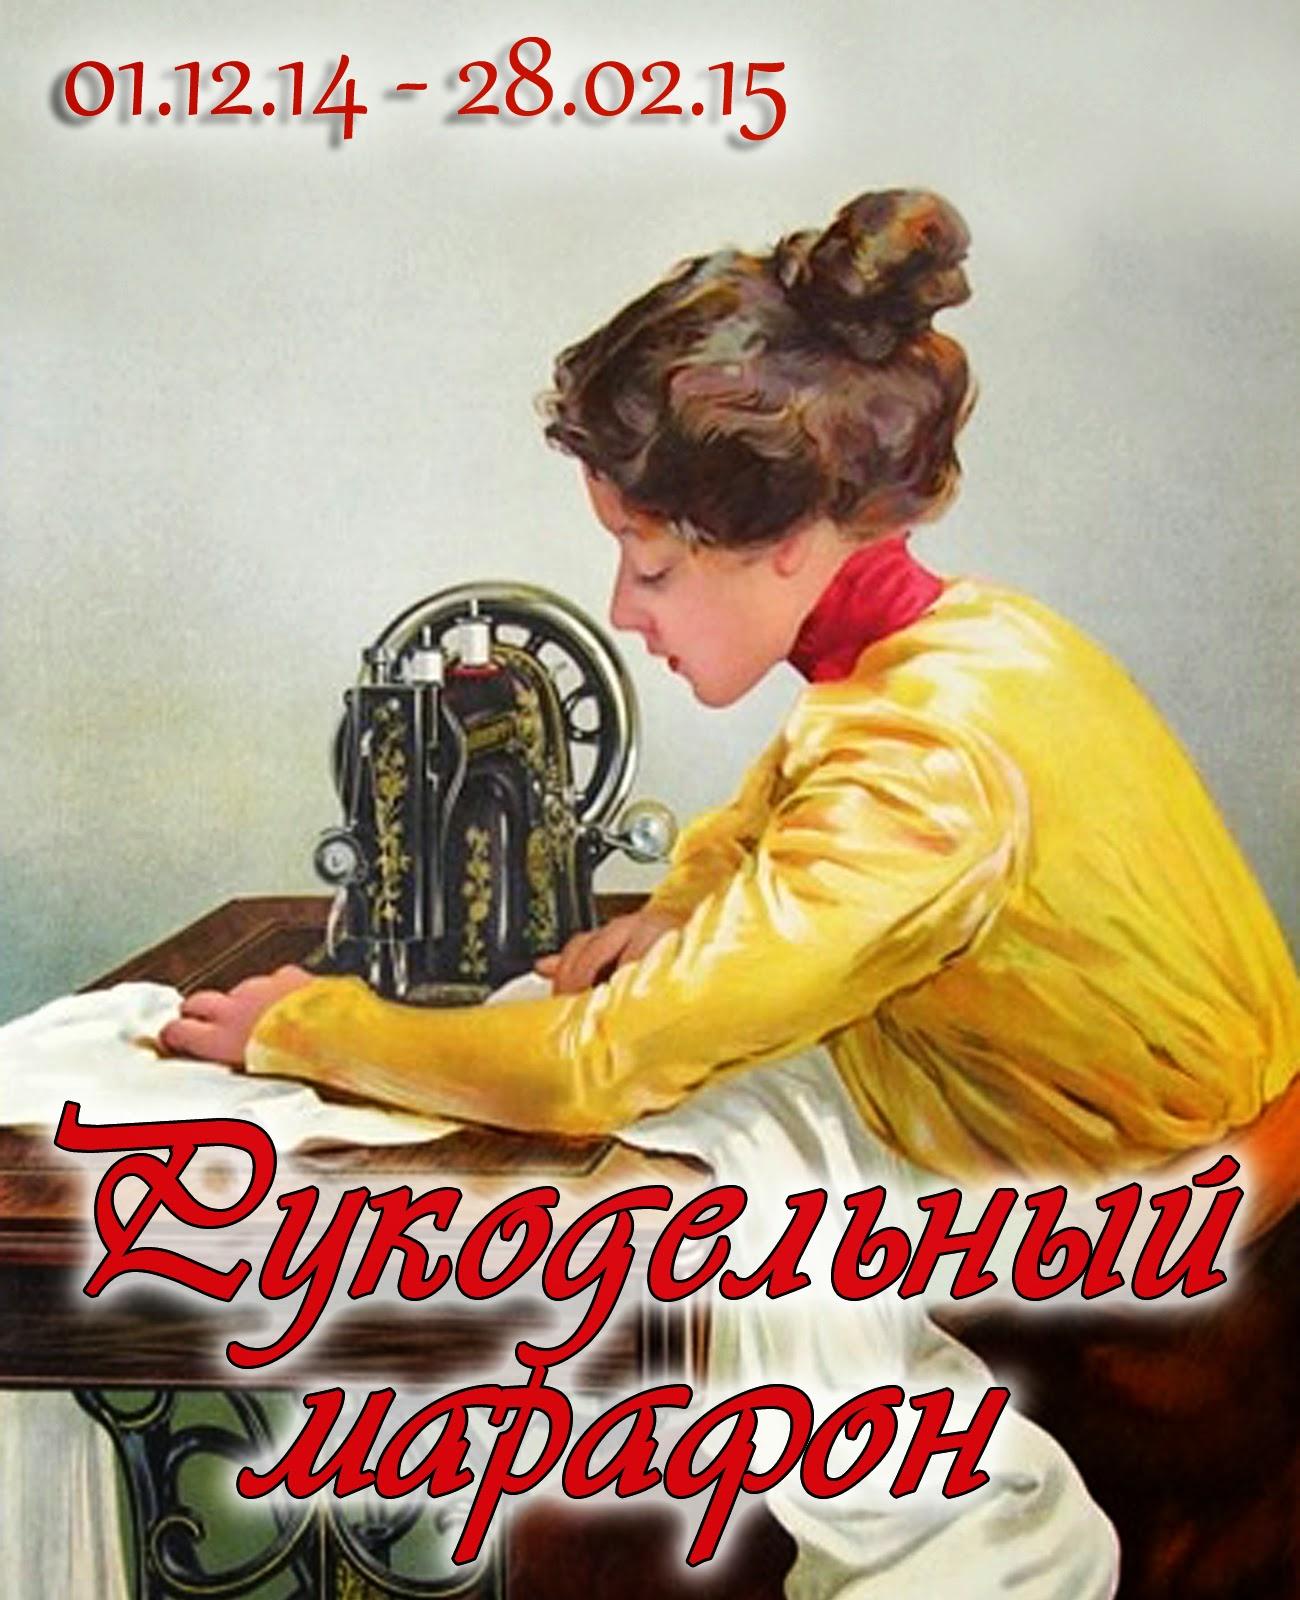 http://mart-hobby.blogspot.ru/2015/02/2015.html